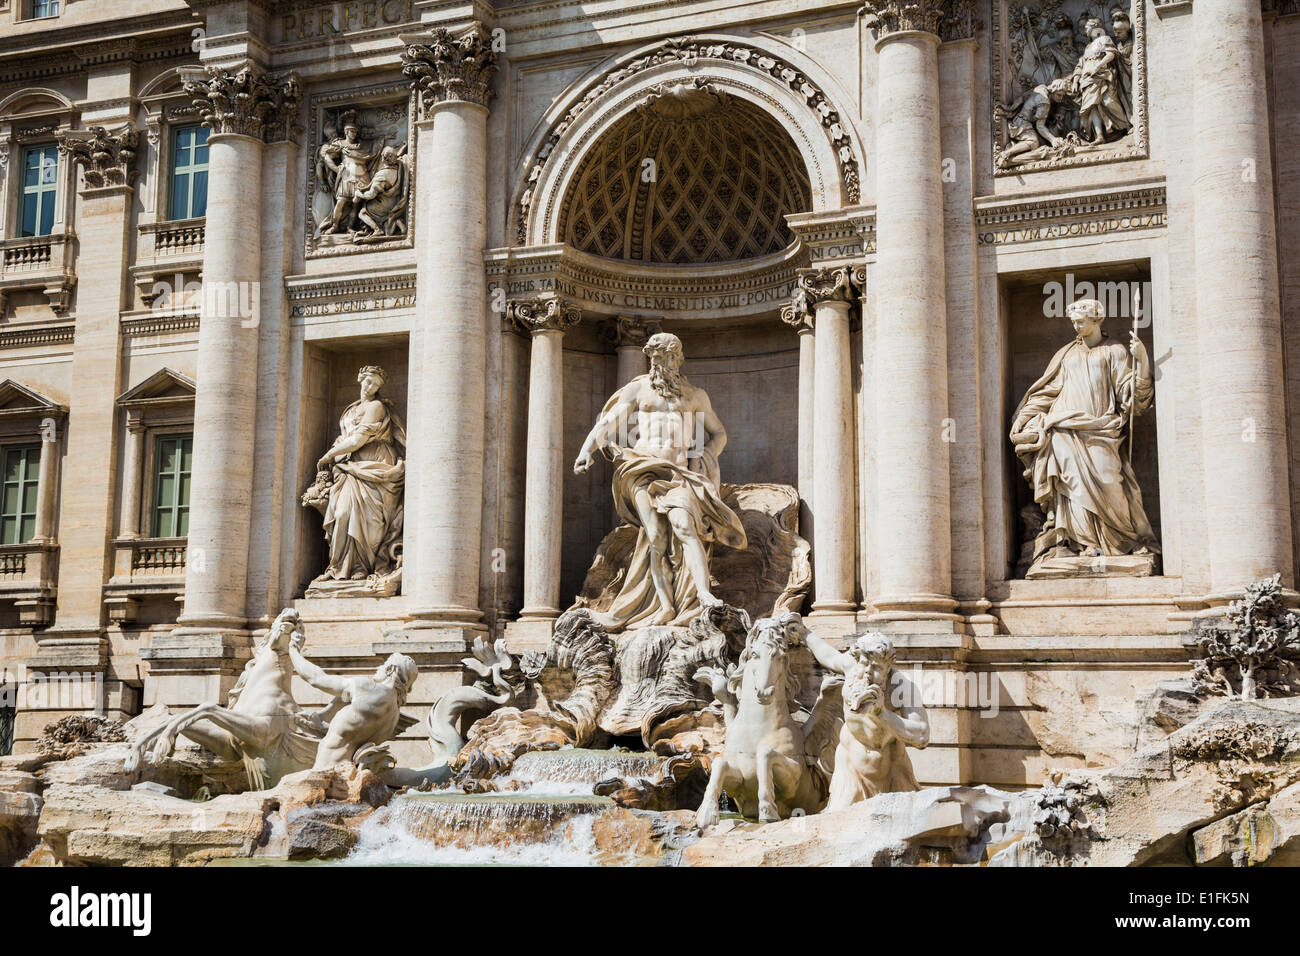 Roma, Italia. La Fontana di Trevi barroco del siglo xviii diseñado por Nicola Salvi. La figura central representa al océano. Imagen De Stock